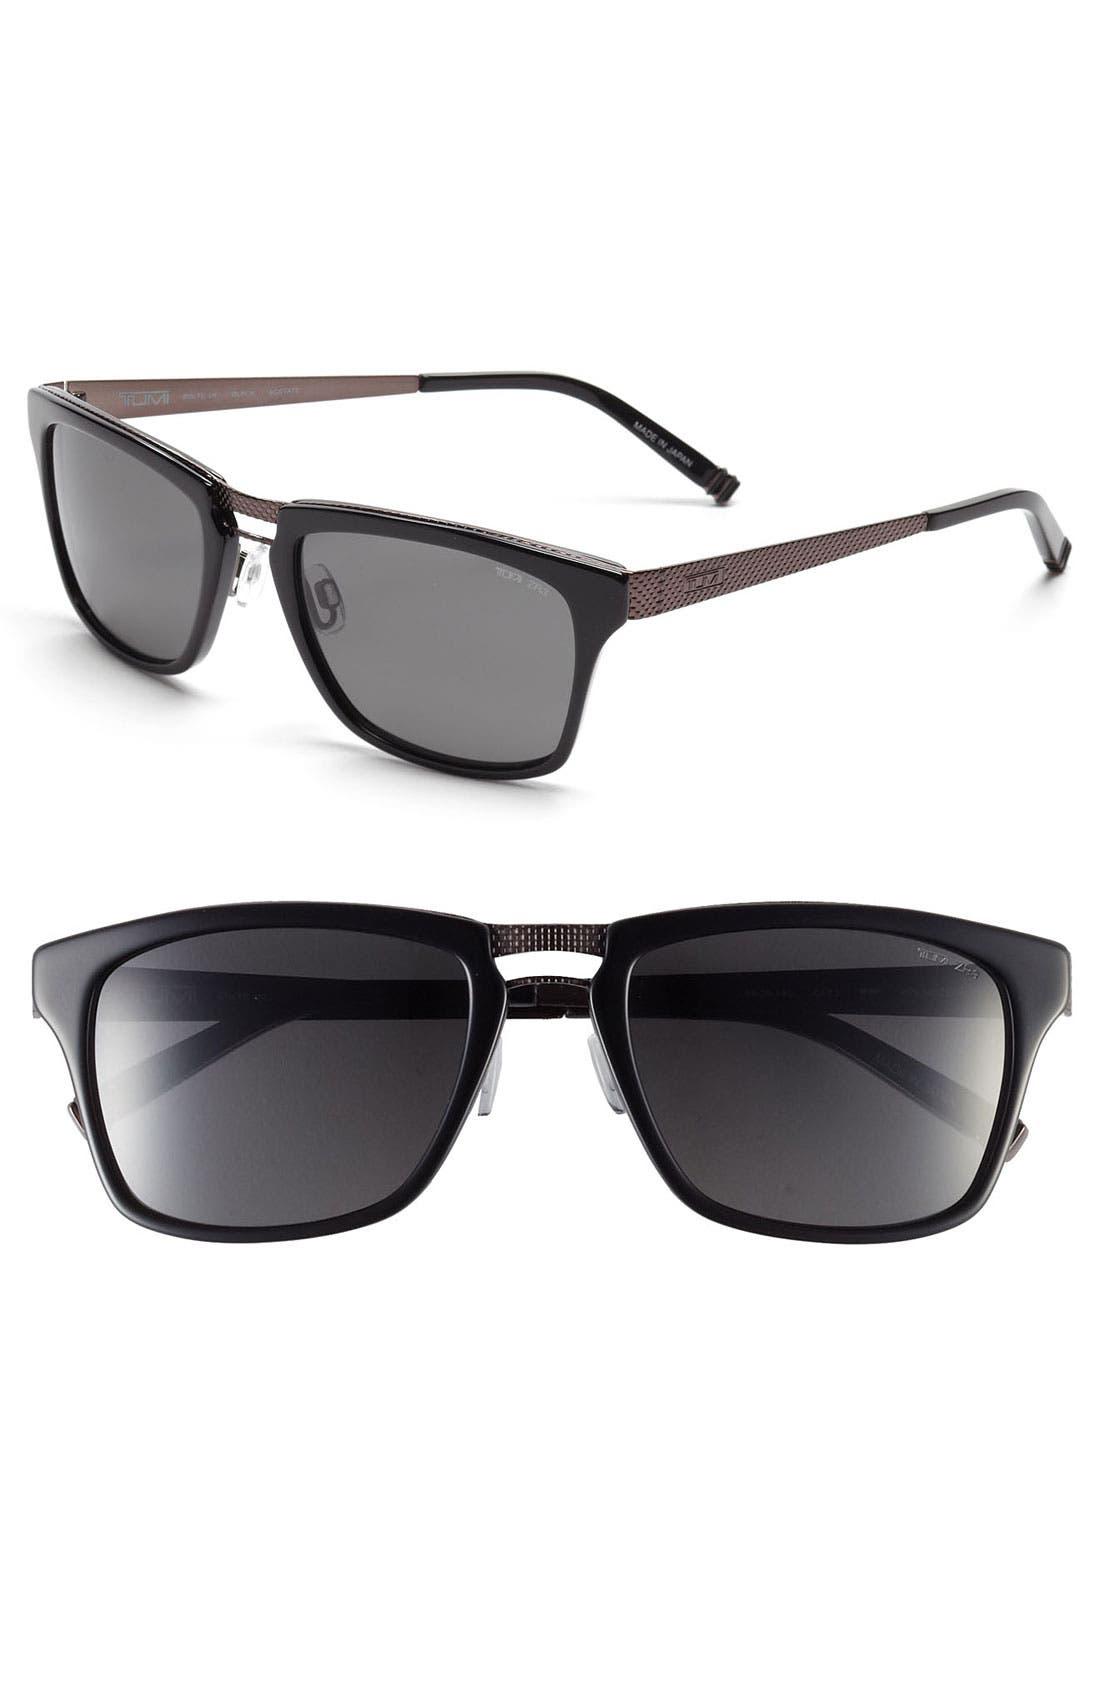 Main Image - Tumi 'Bolte' 54mm Polarized Sunglasses